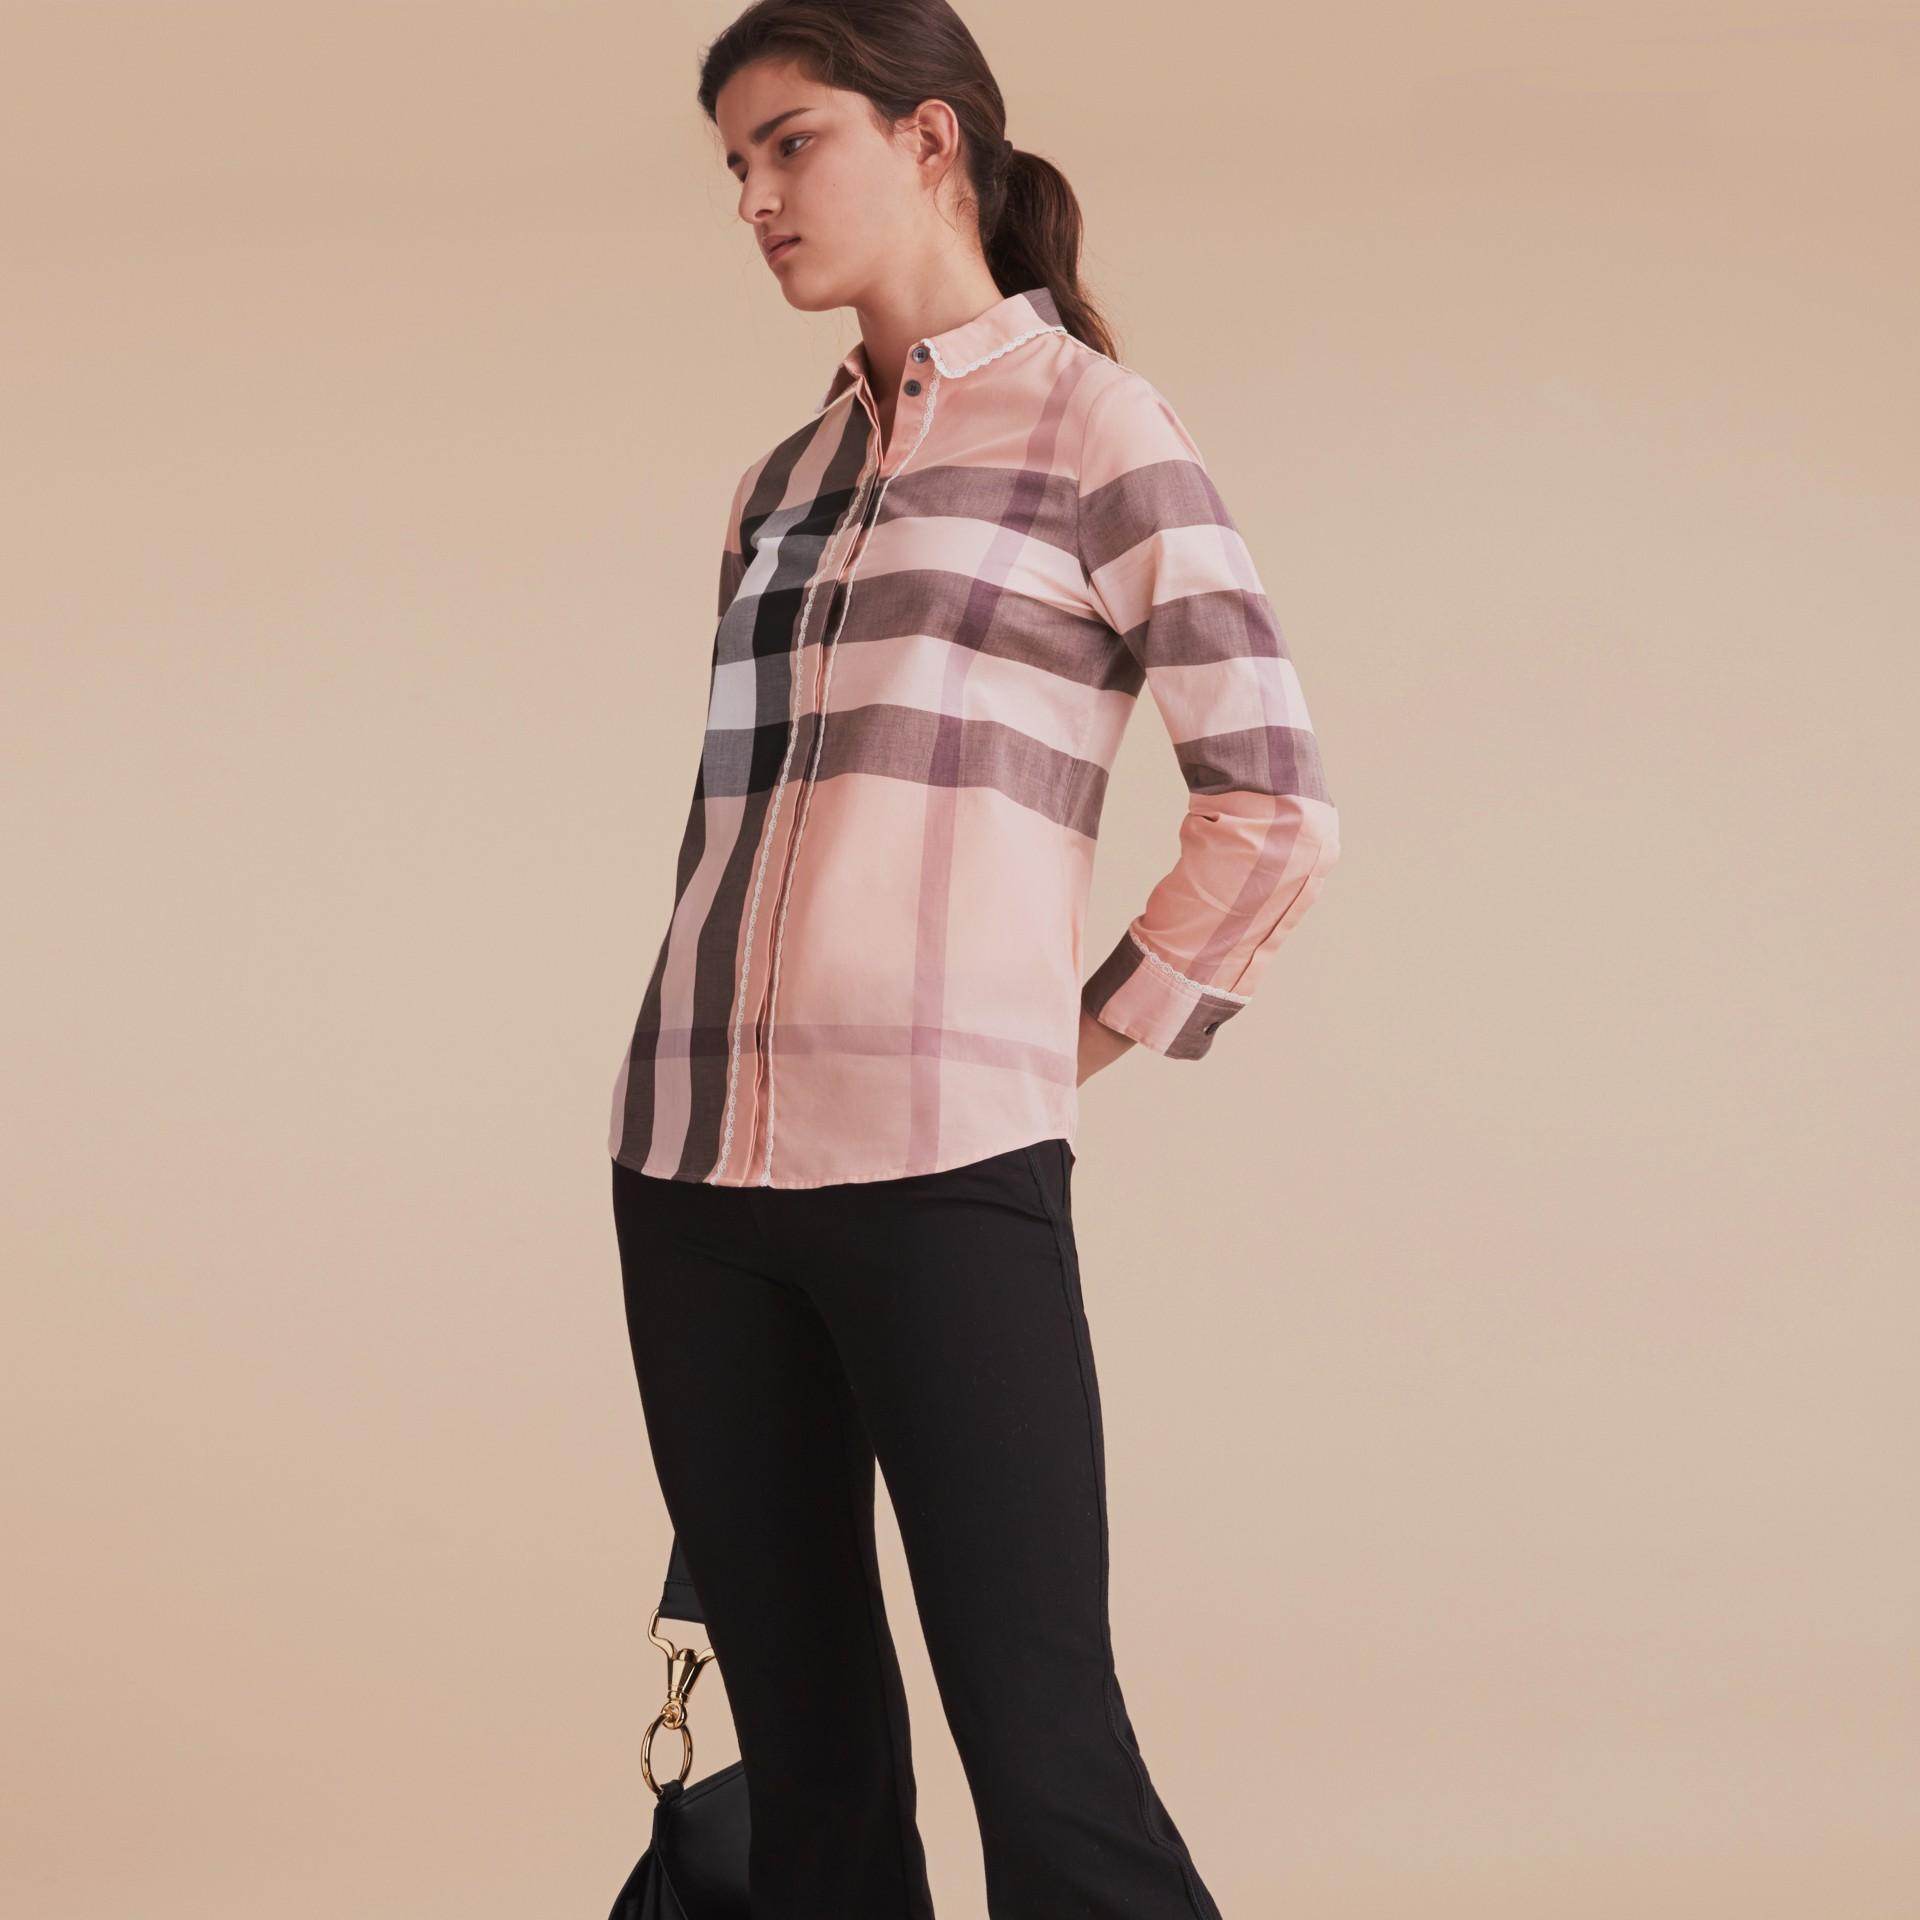 Lace Trim Check Cotton Shirt Antique Pink - gallery image 6